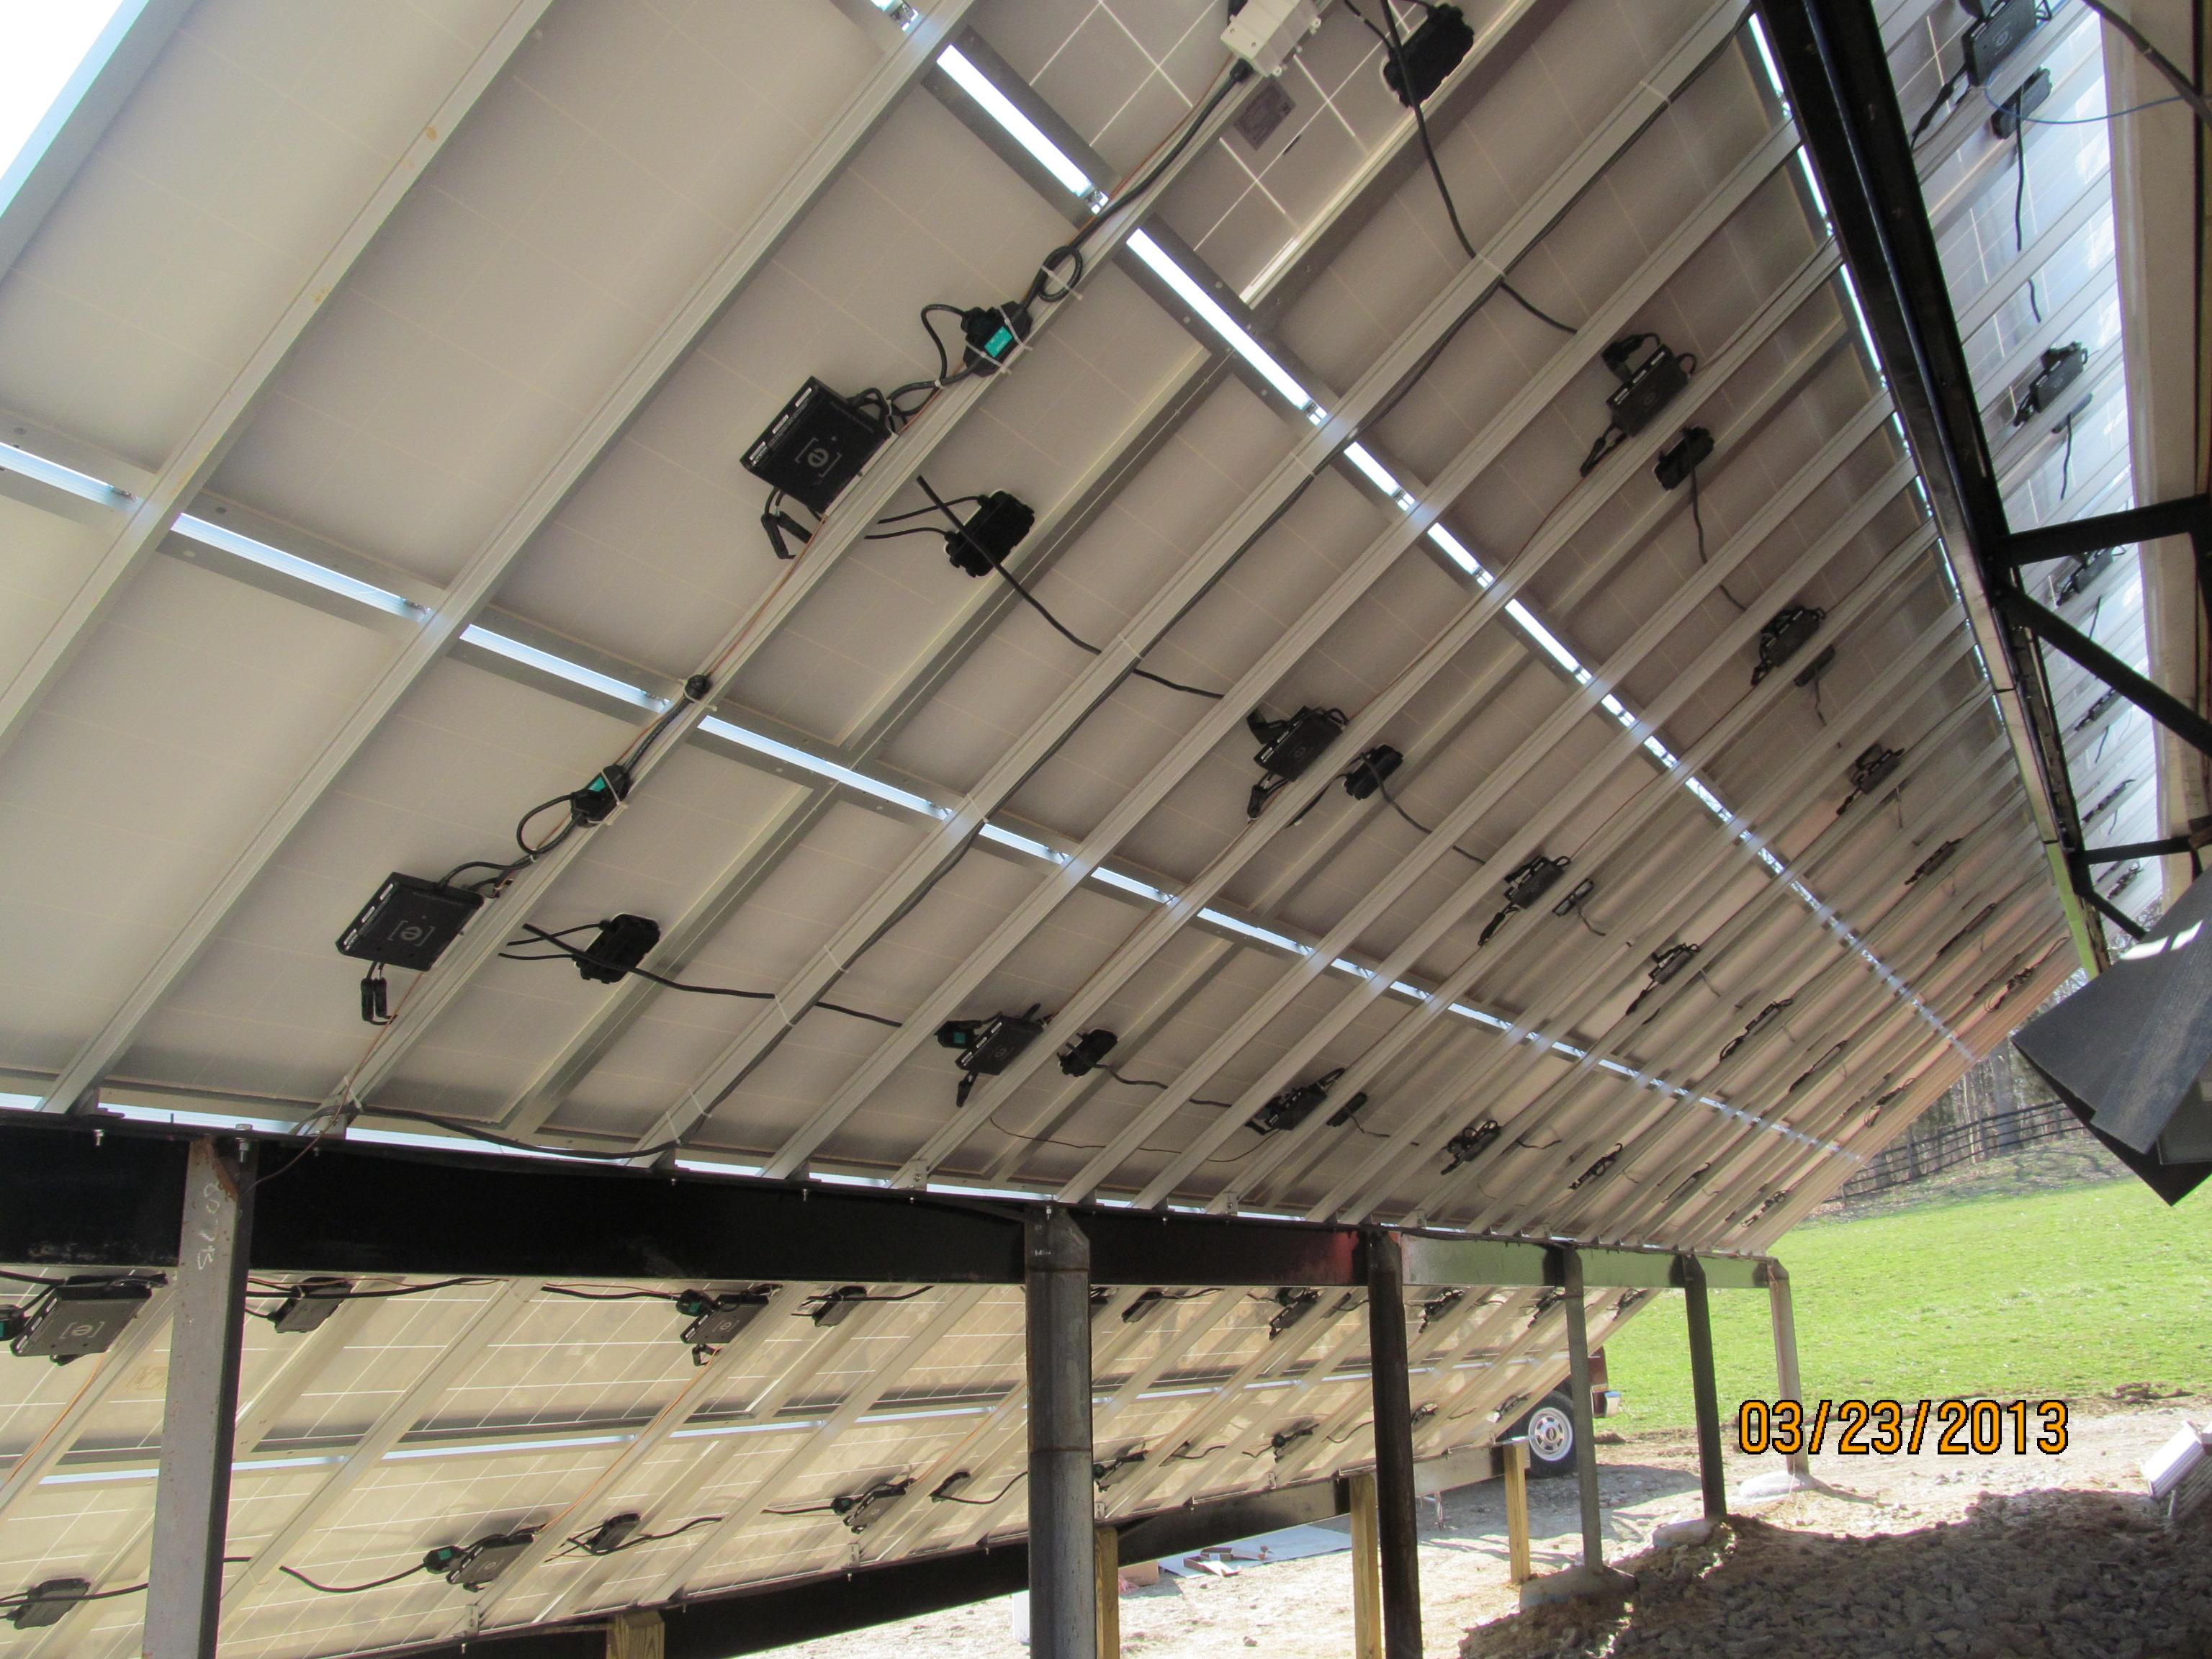 diy solar panel system wiring diagram 220v generator plug panels installation